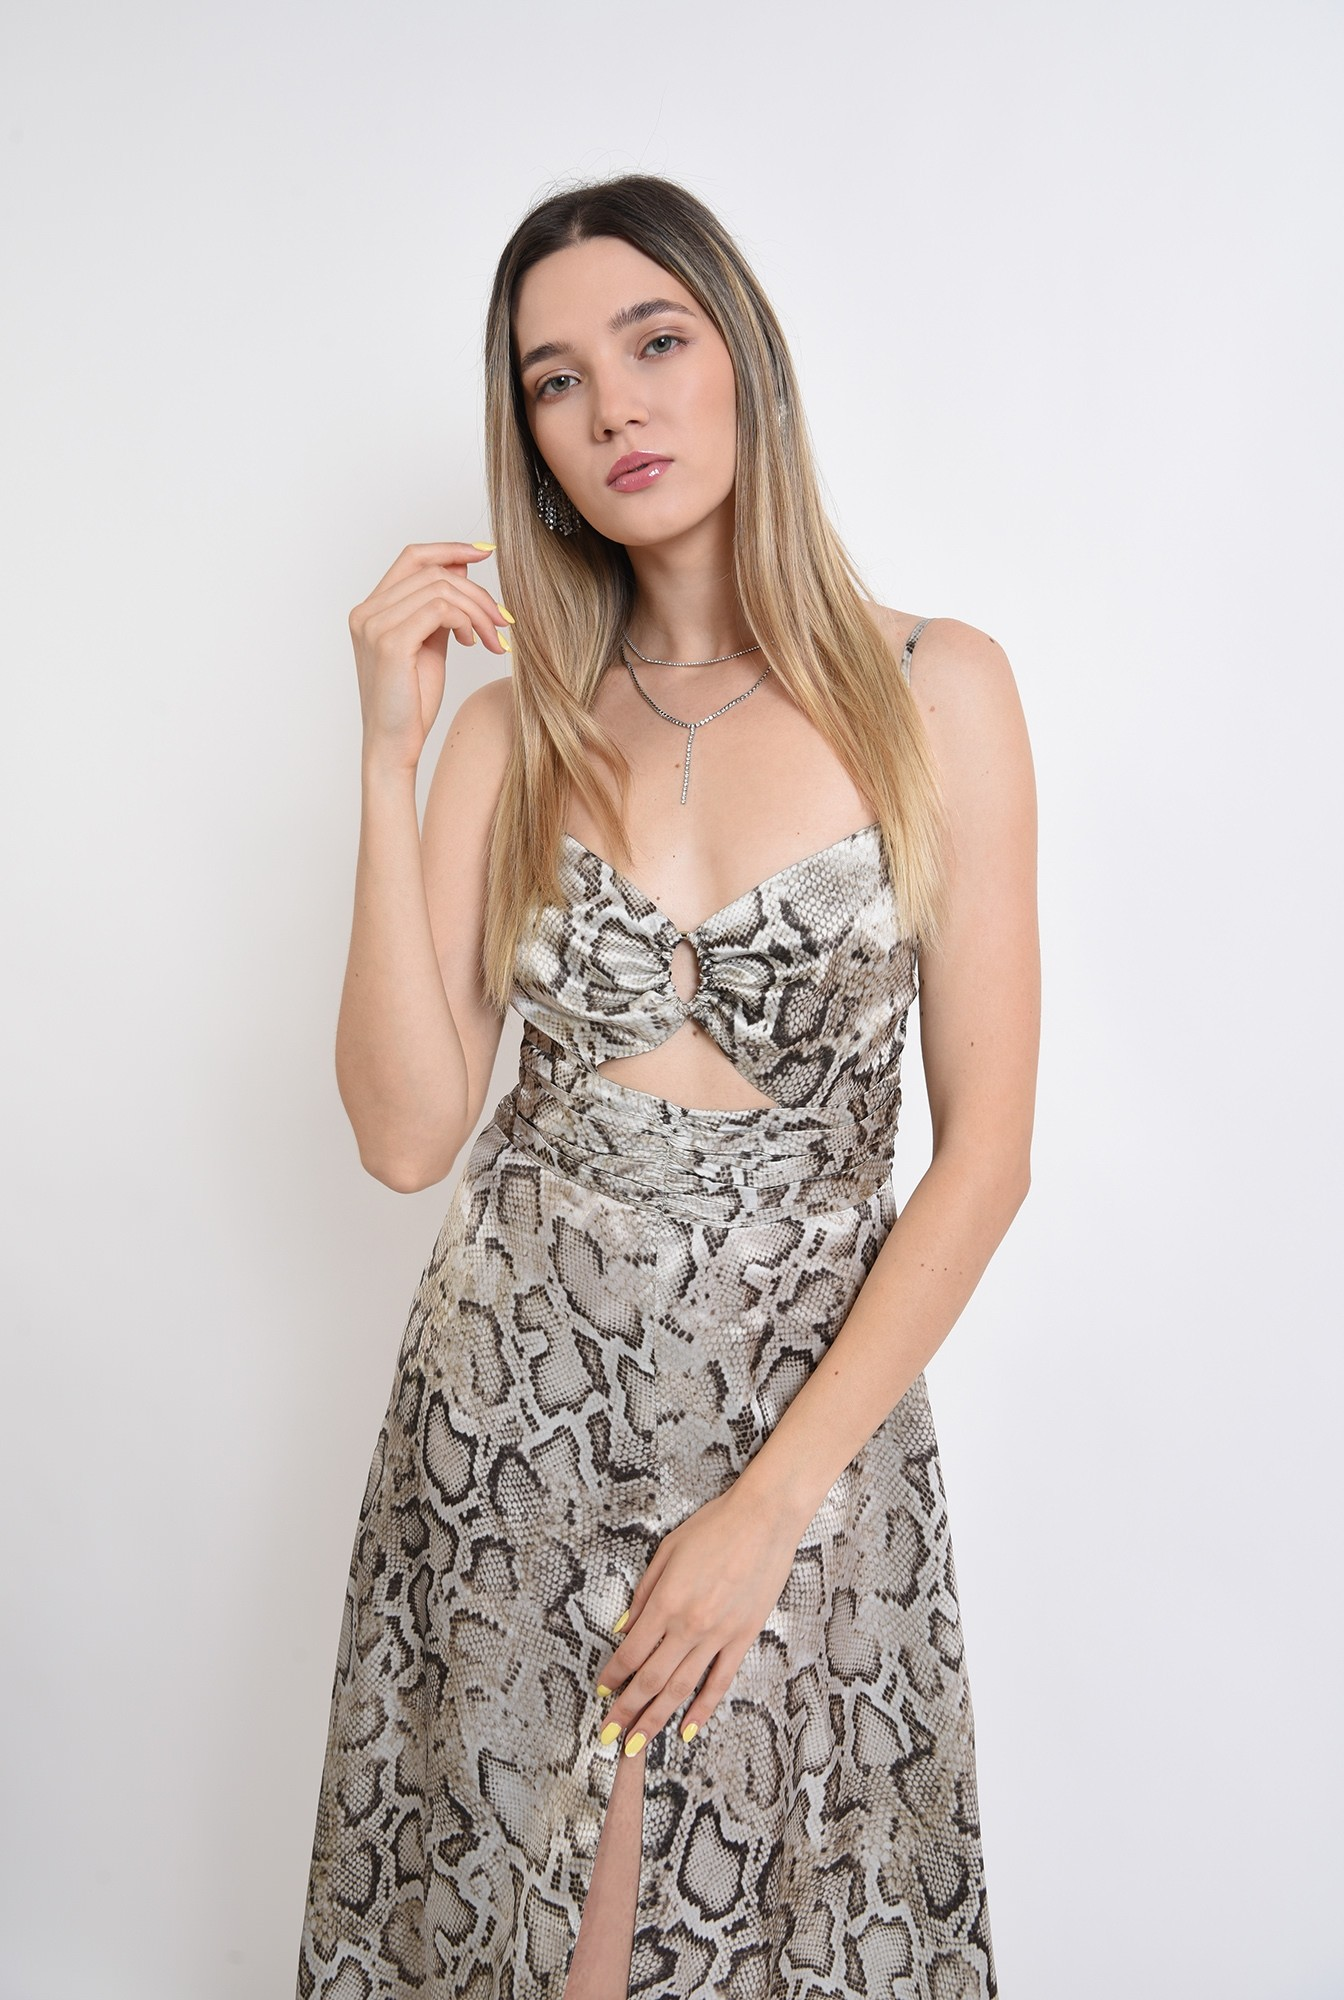 2 - rochie midi, eleganta, animal print, cu decupaj, fronsata pe accesoriu